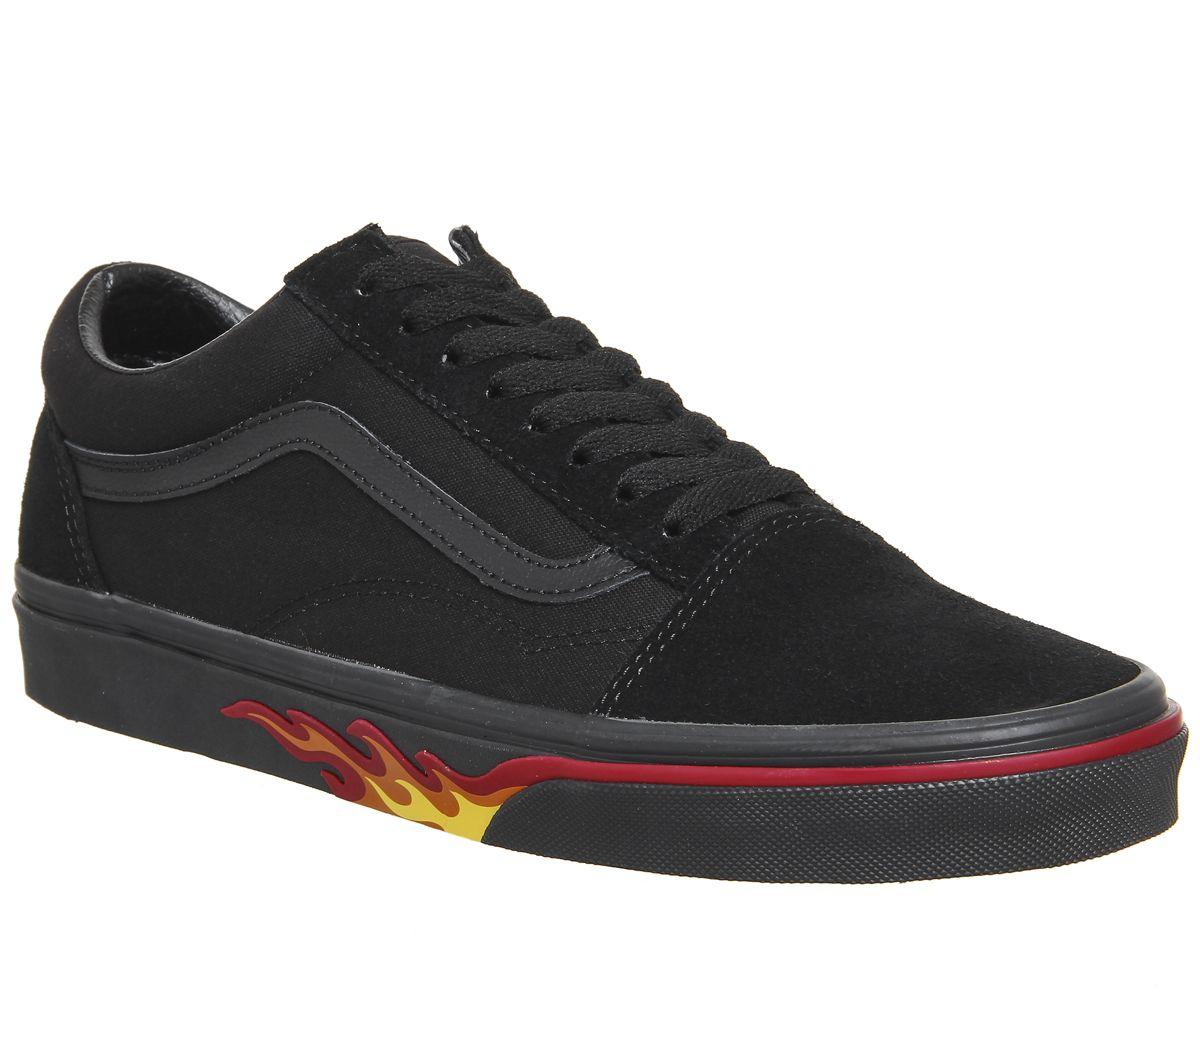 f5ef7688613540 Vans Old Skool Trainers Black Flame Wall - Unisex Sports